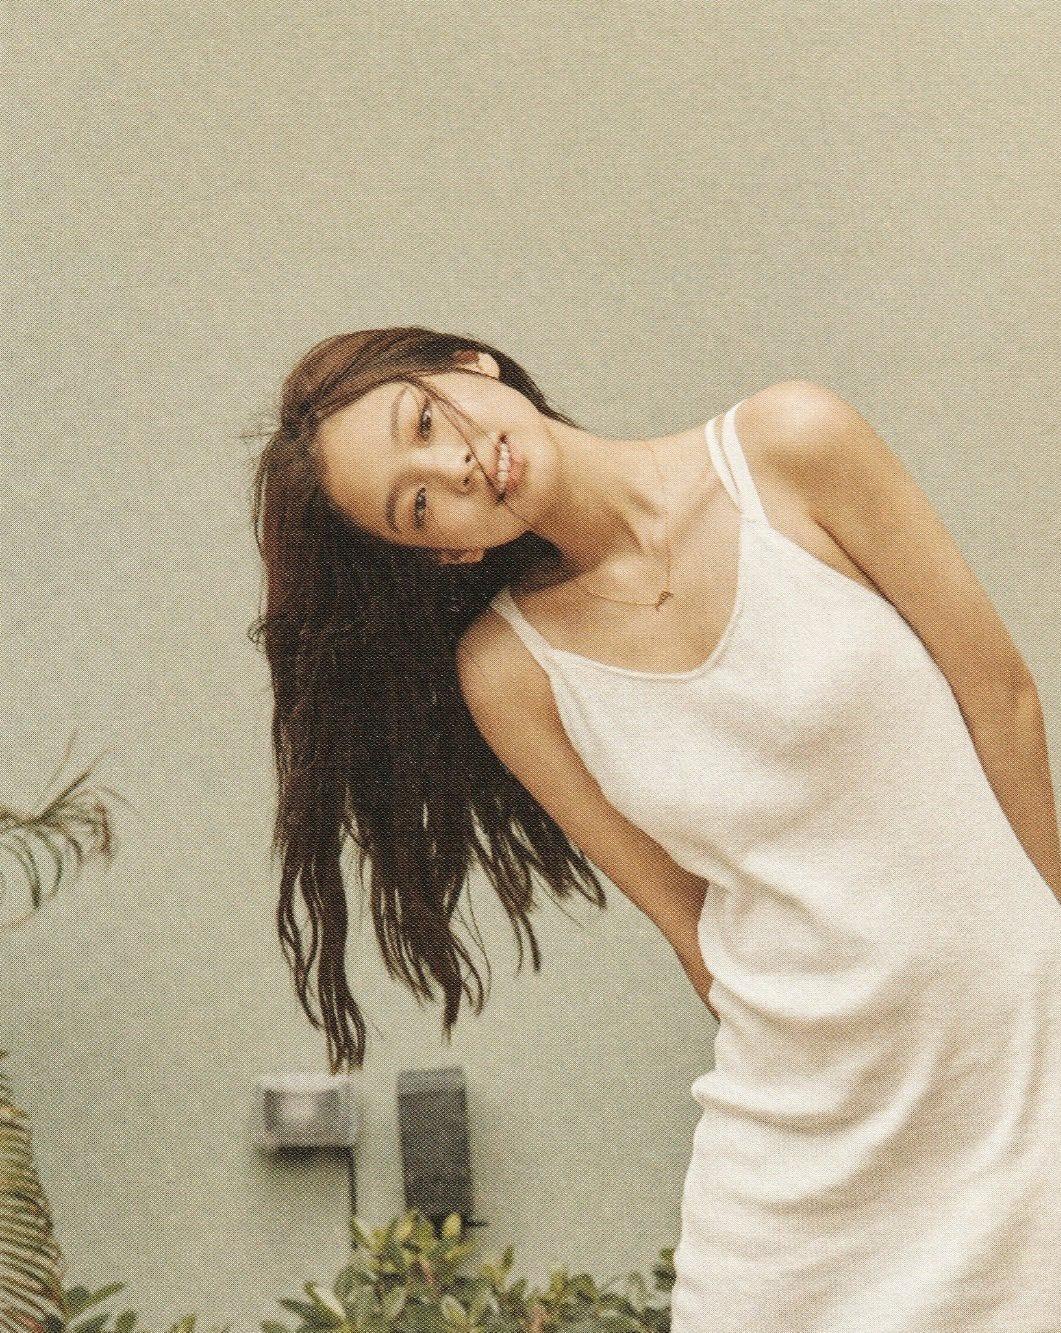 Jennie最新胶片质感写真,身穿白色吊带裙,是初恋女孩